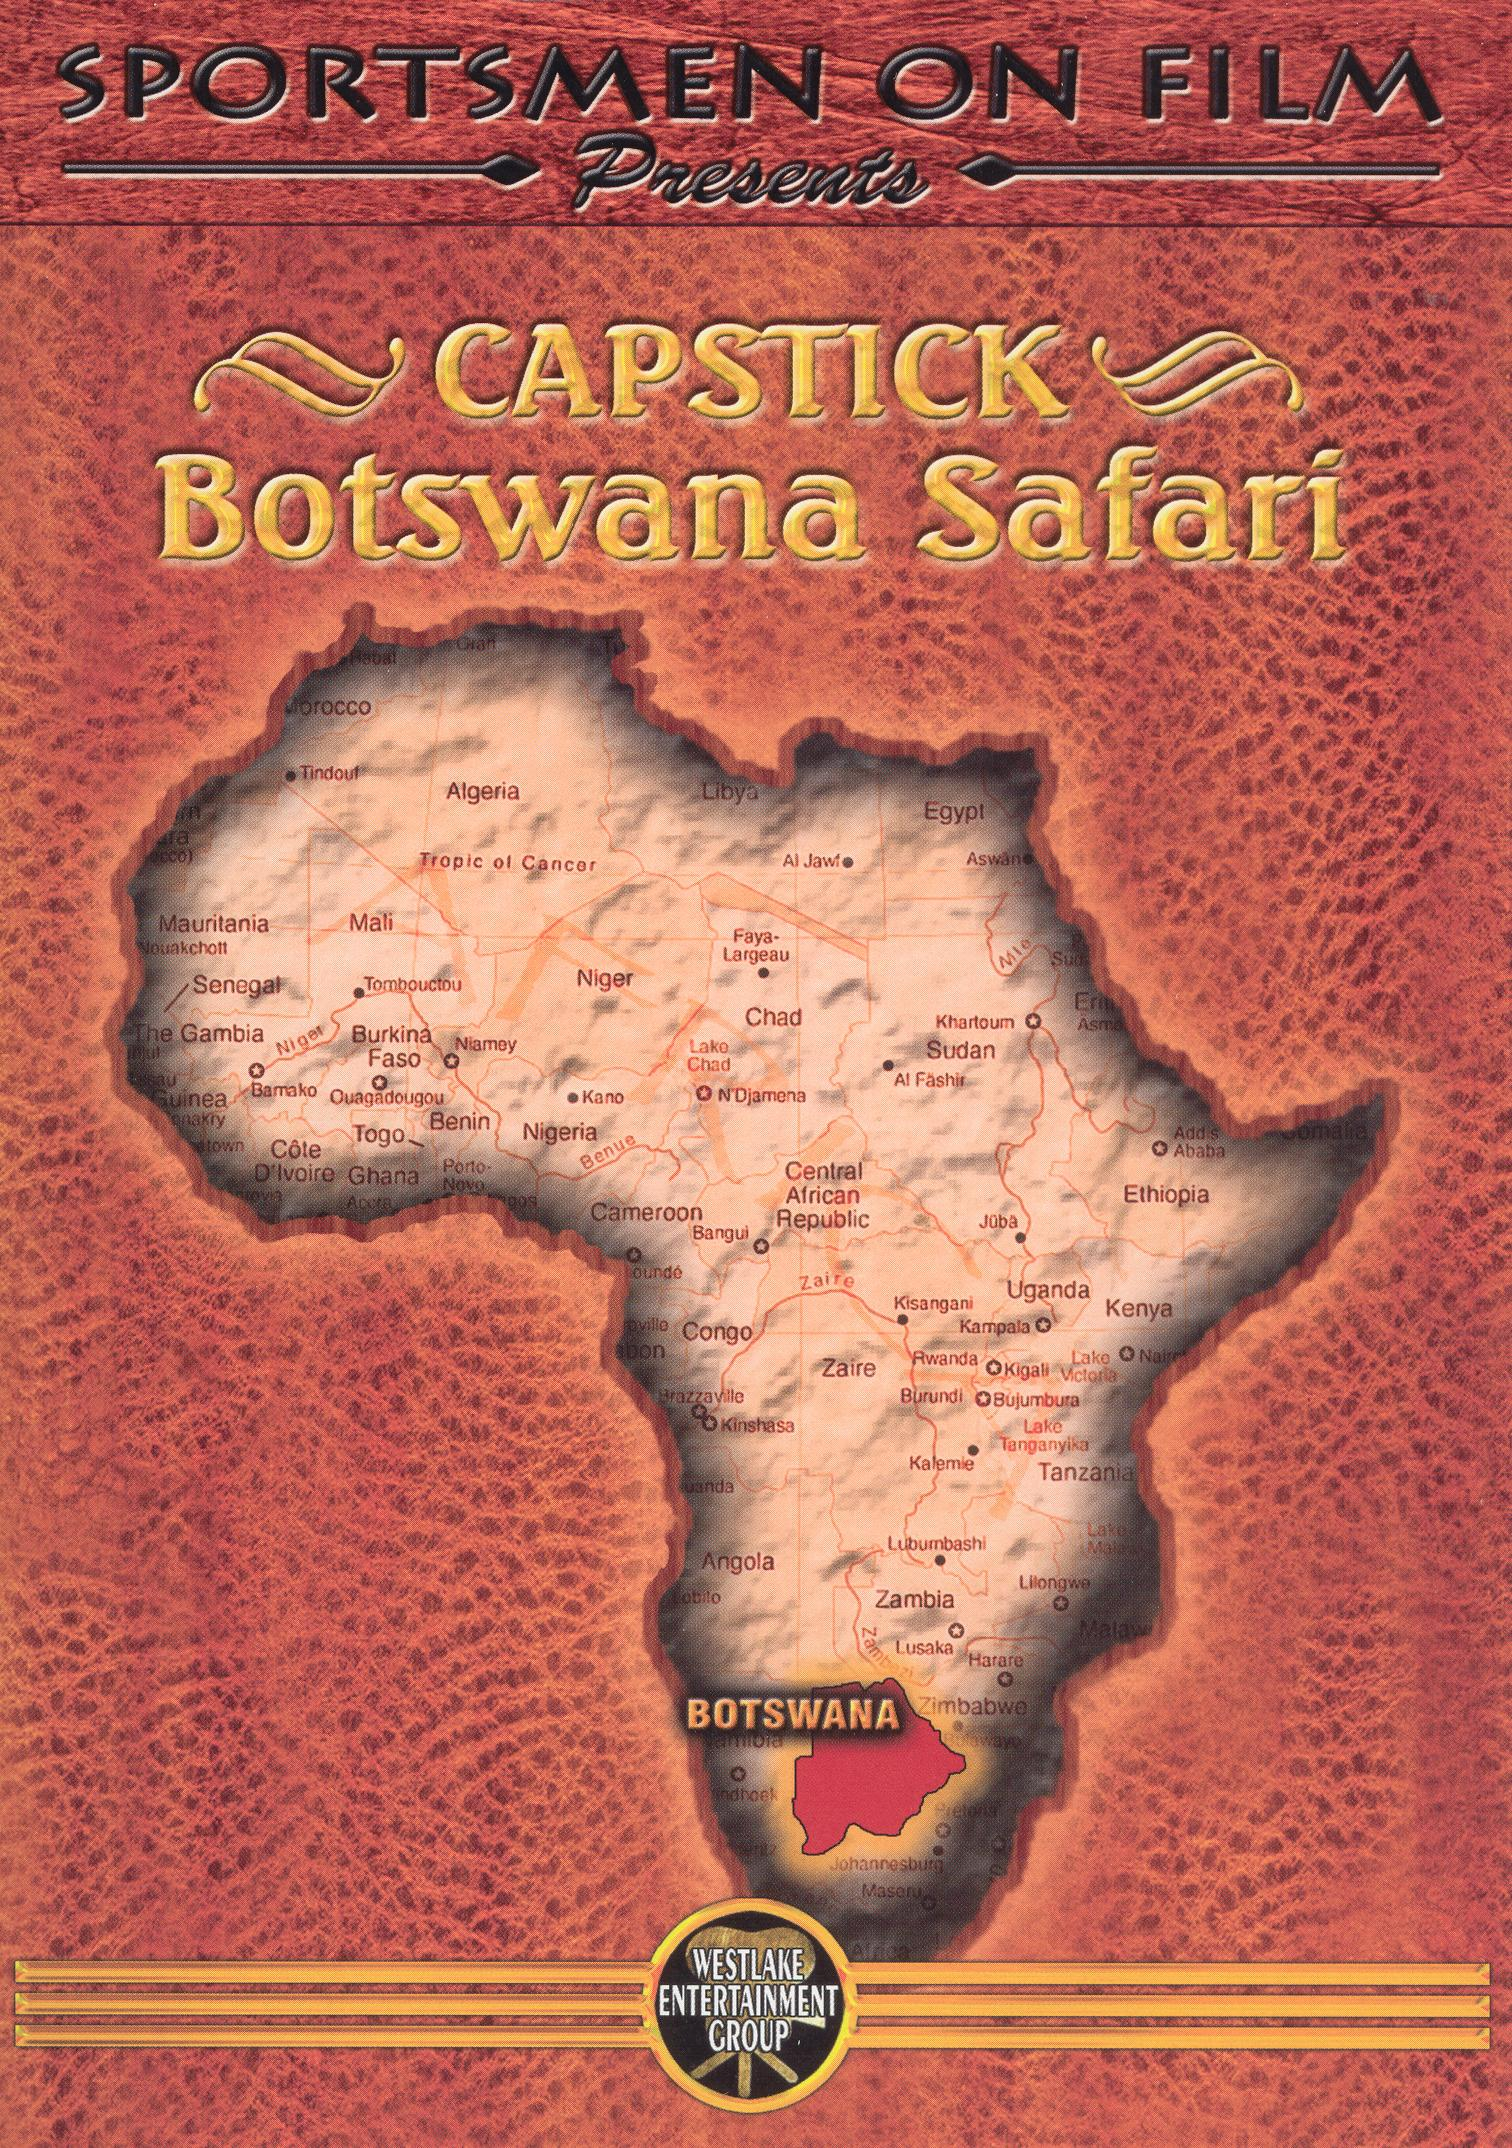 Capstick: Botswana Safari